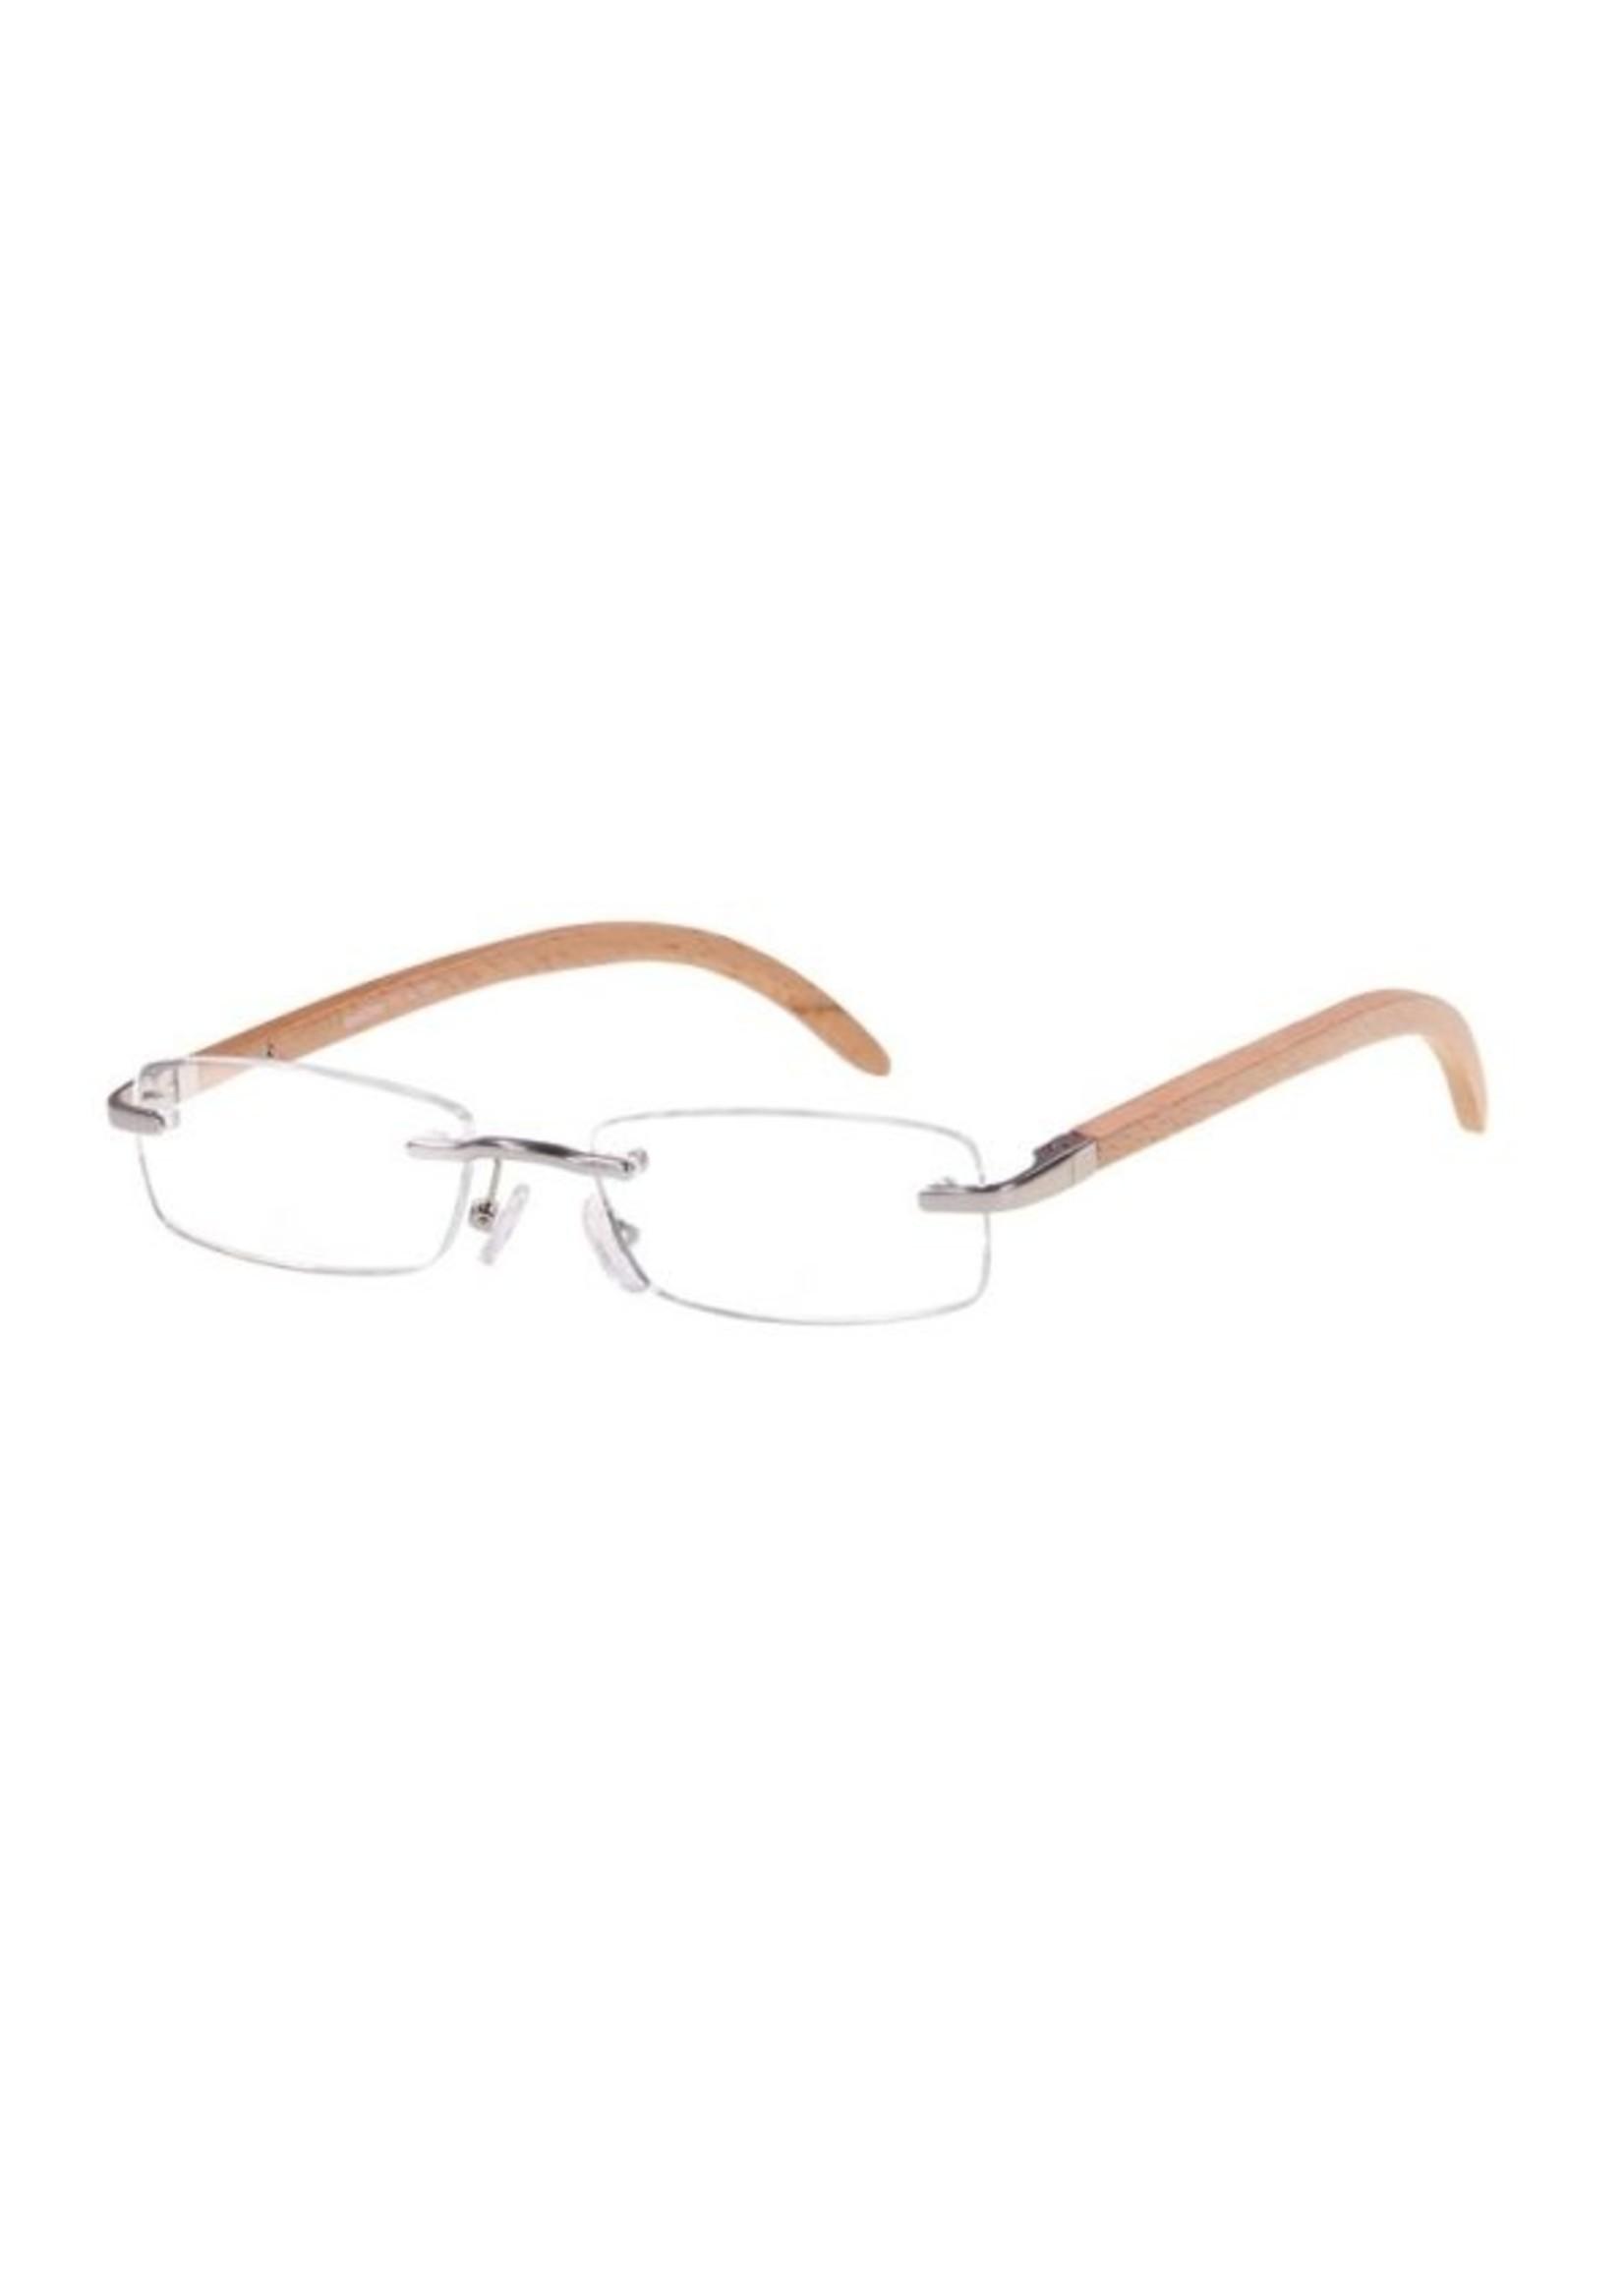 Ofar Ofar Stijlvolle Leesbril Randloos in natuurlijk Bamboe